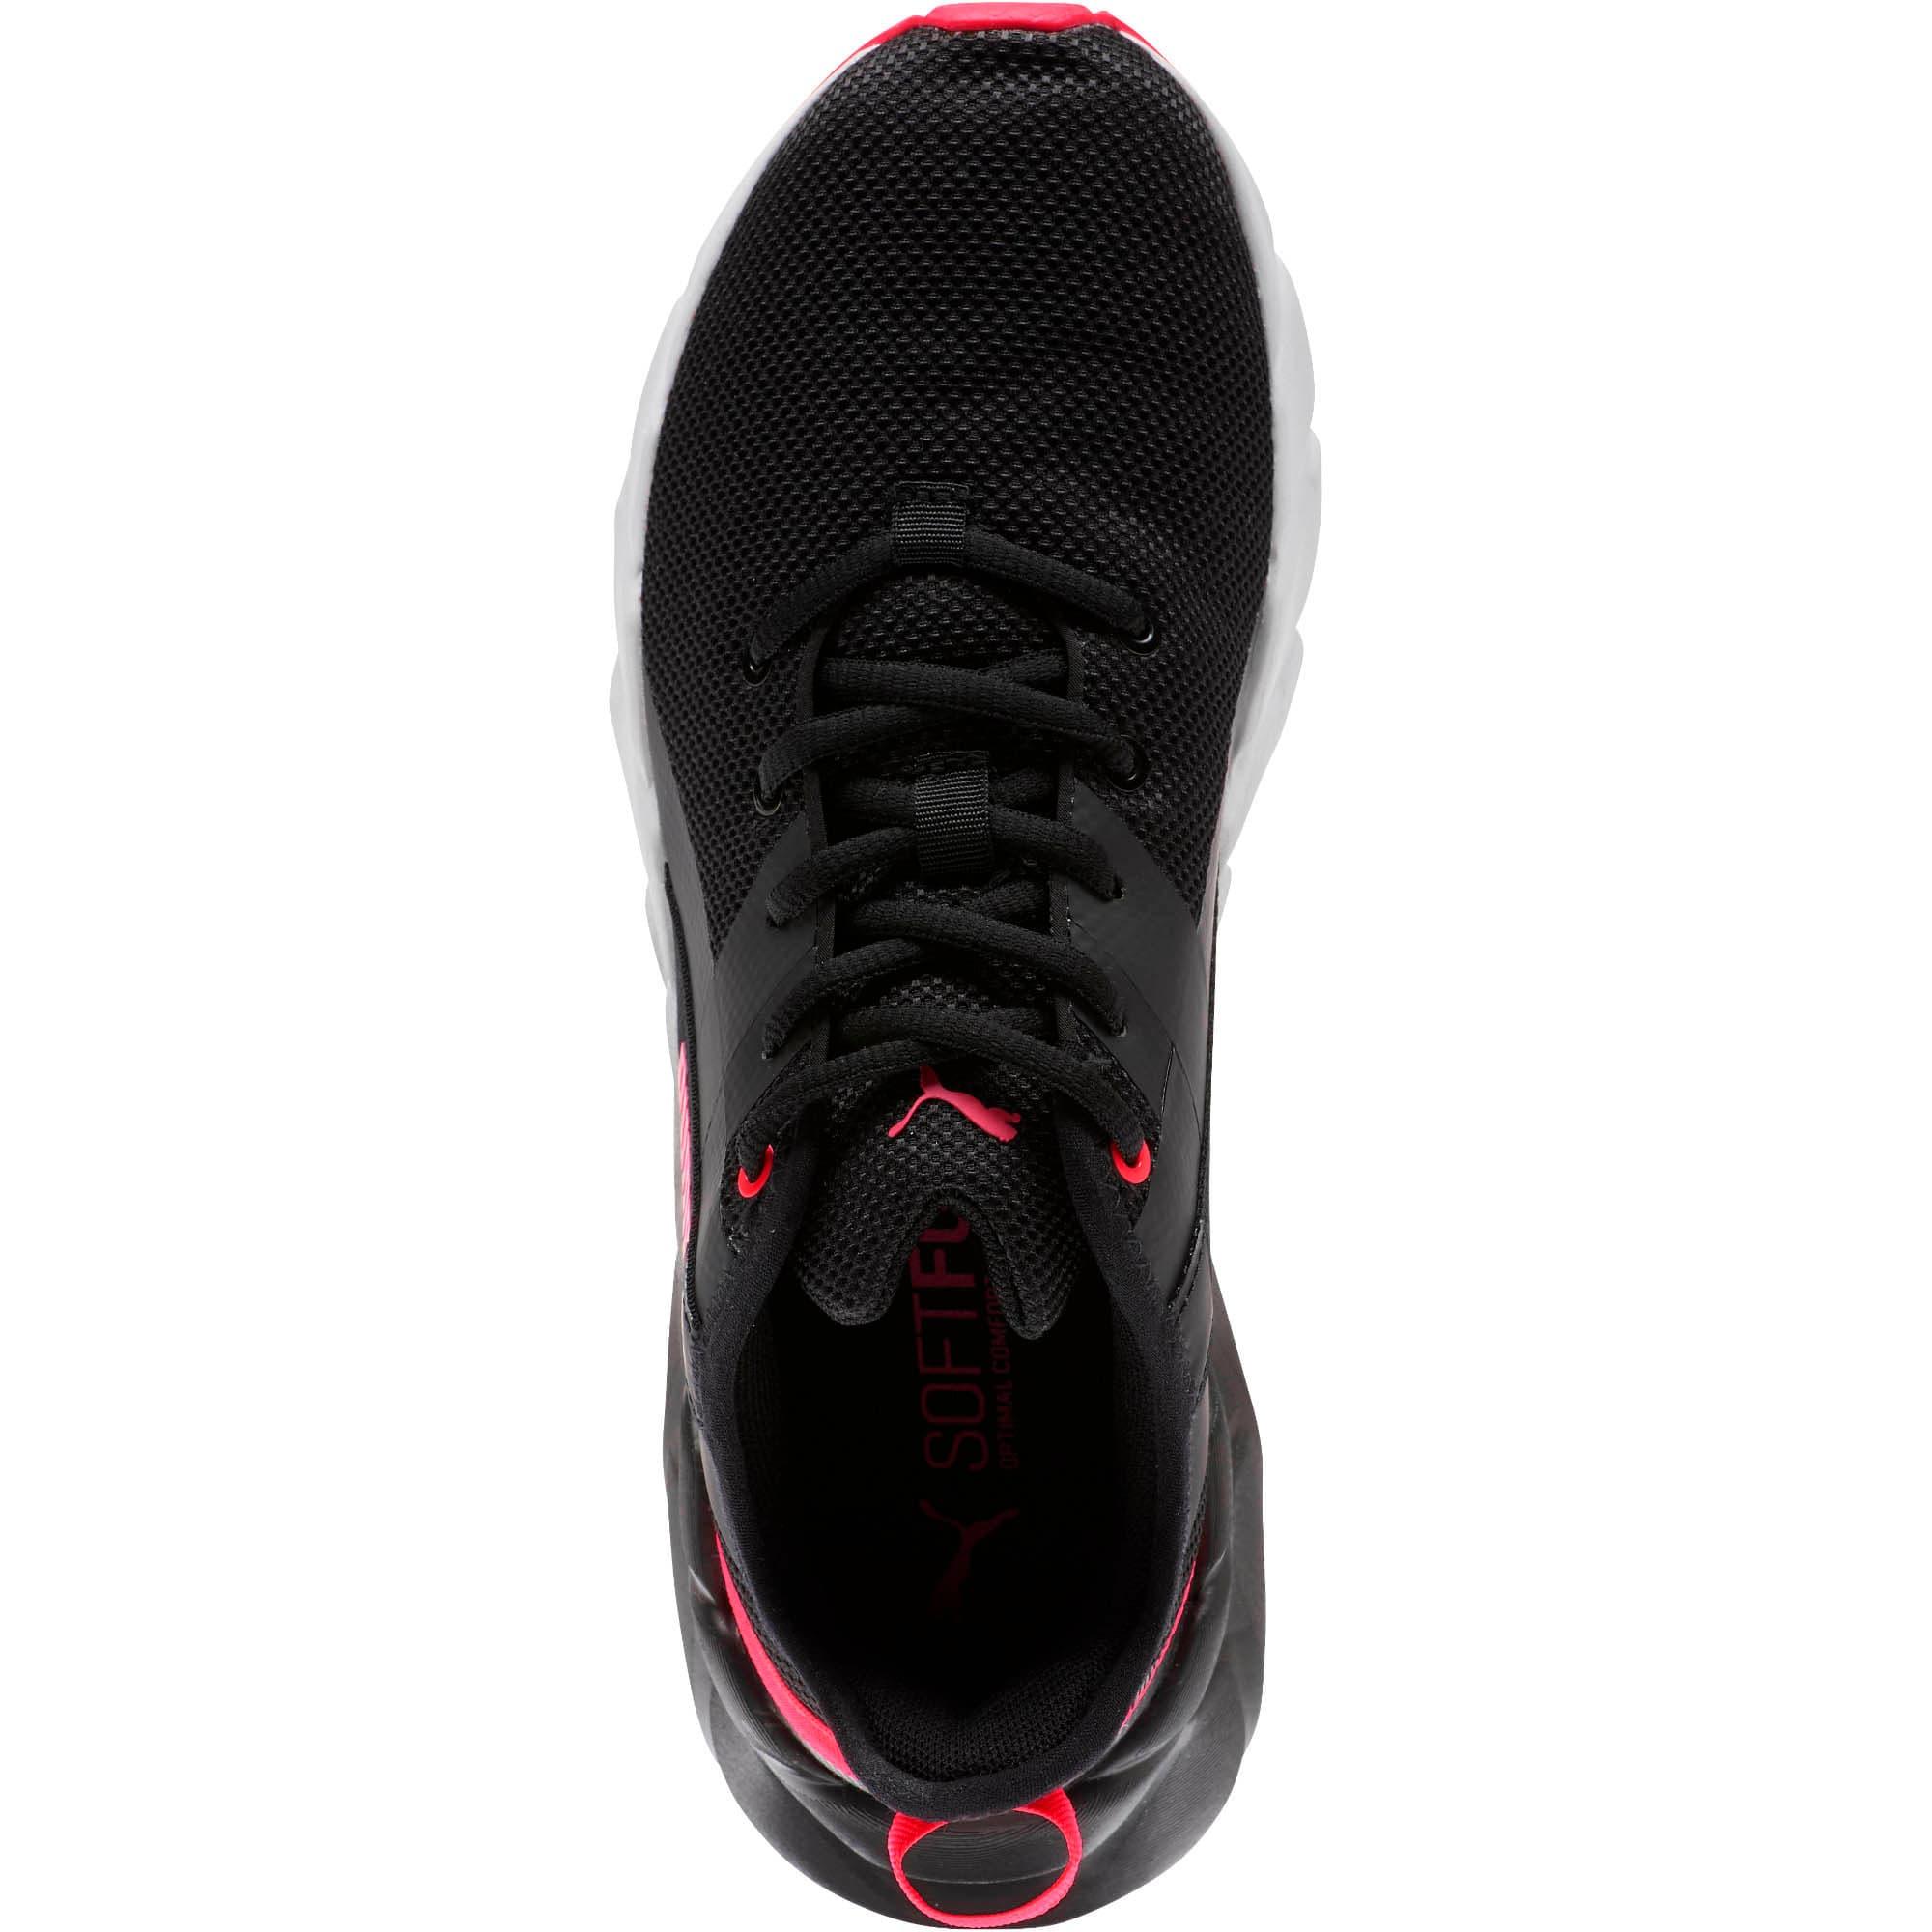 Thumbnail 5 of Weave XT Fade Women's Training Shoes, Puma Black-Pink Alert, medium